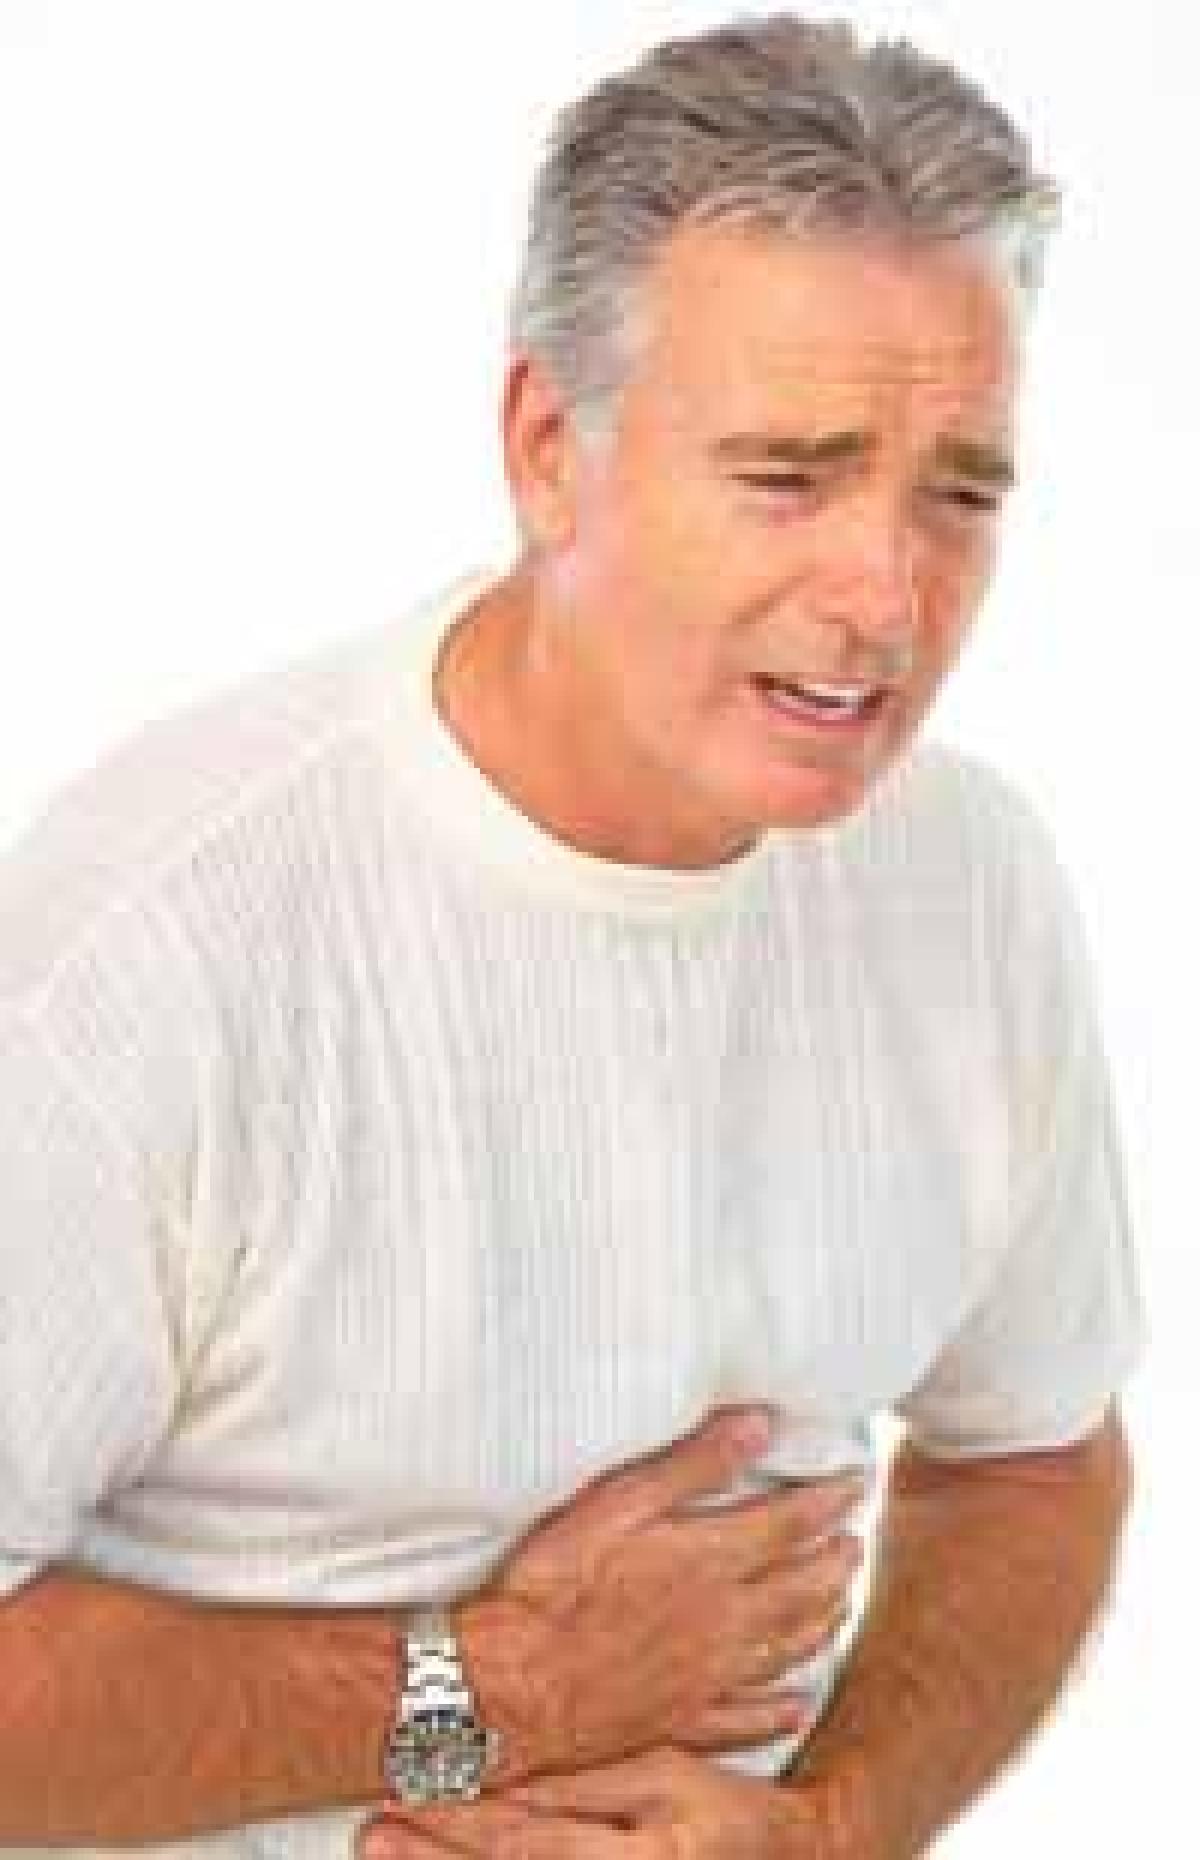 Parasitic worms can help treat chronic diarrhoea